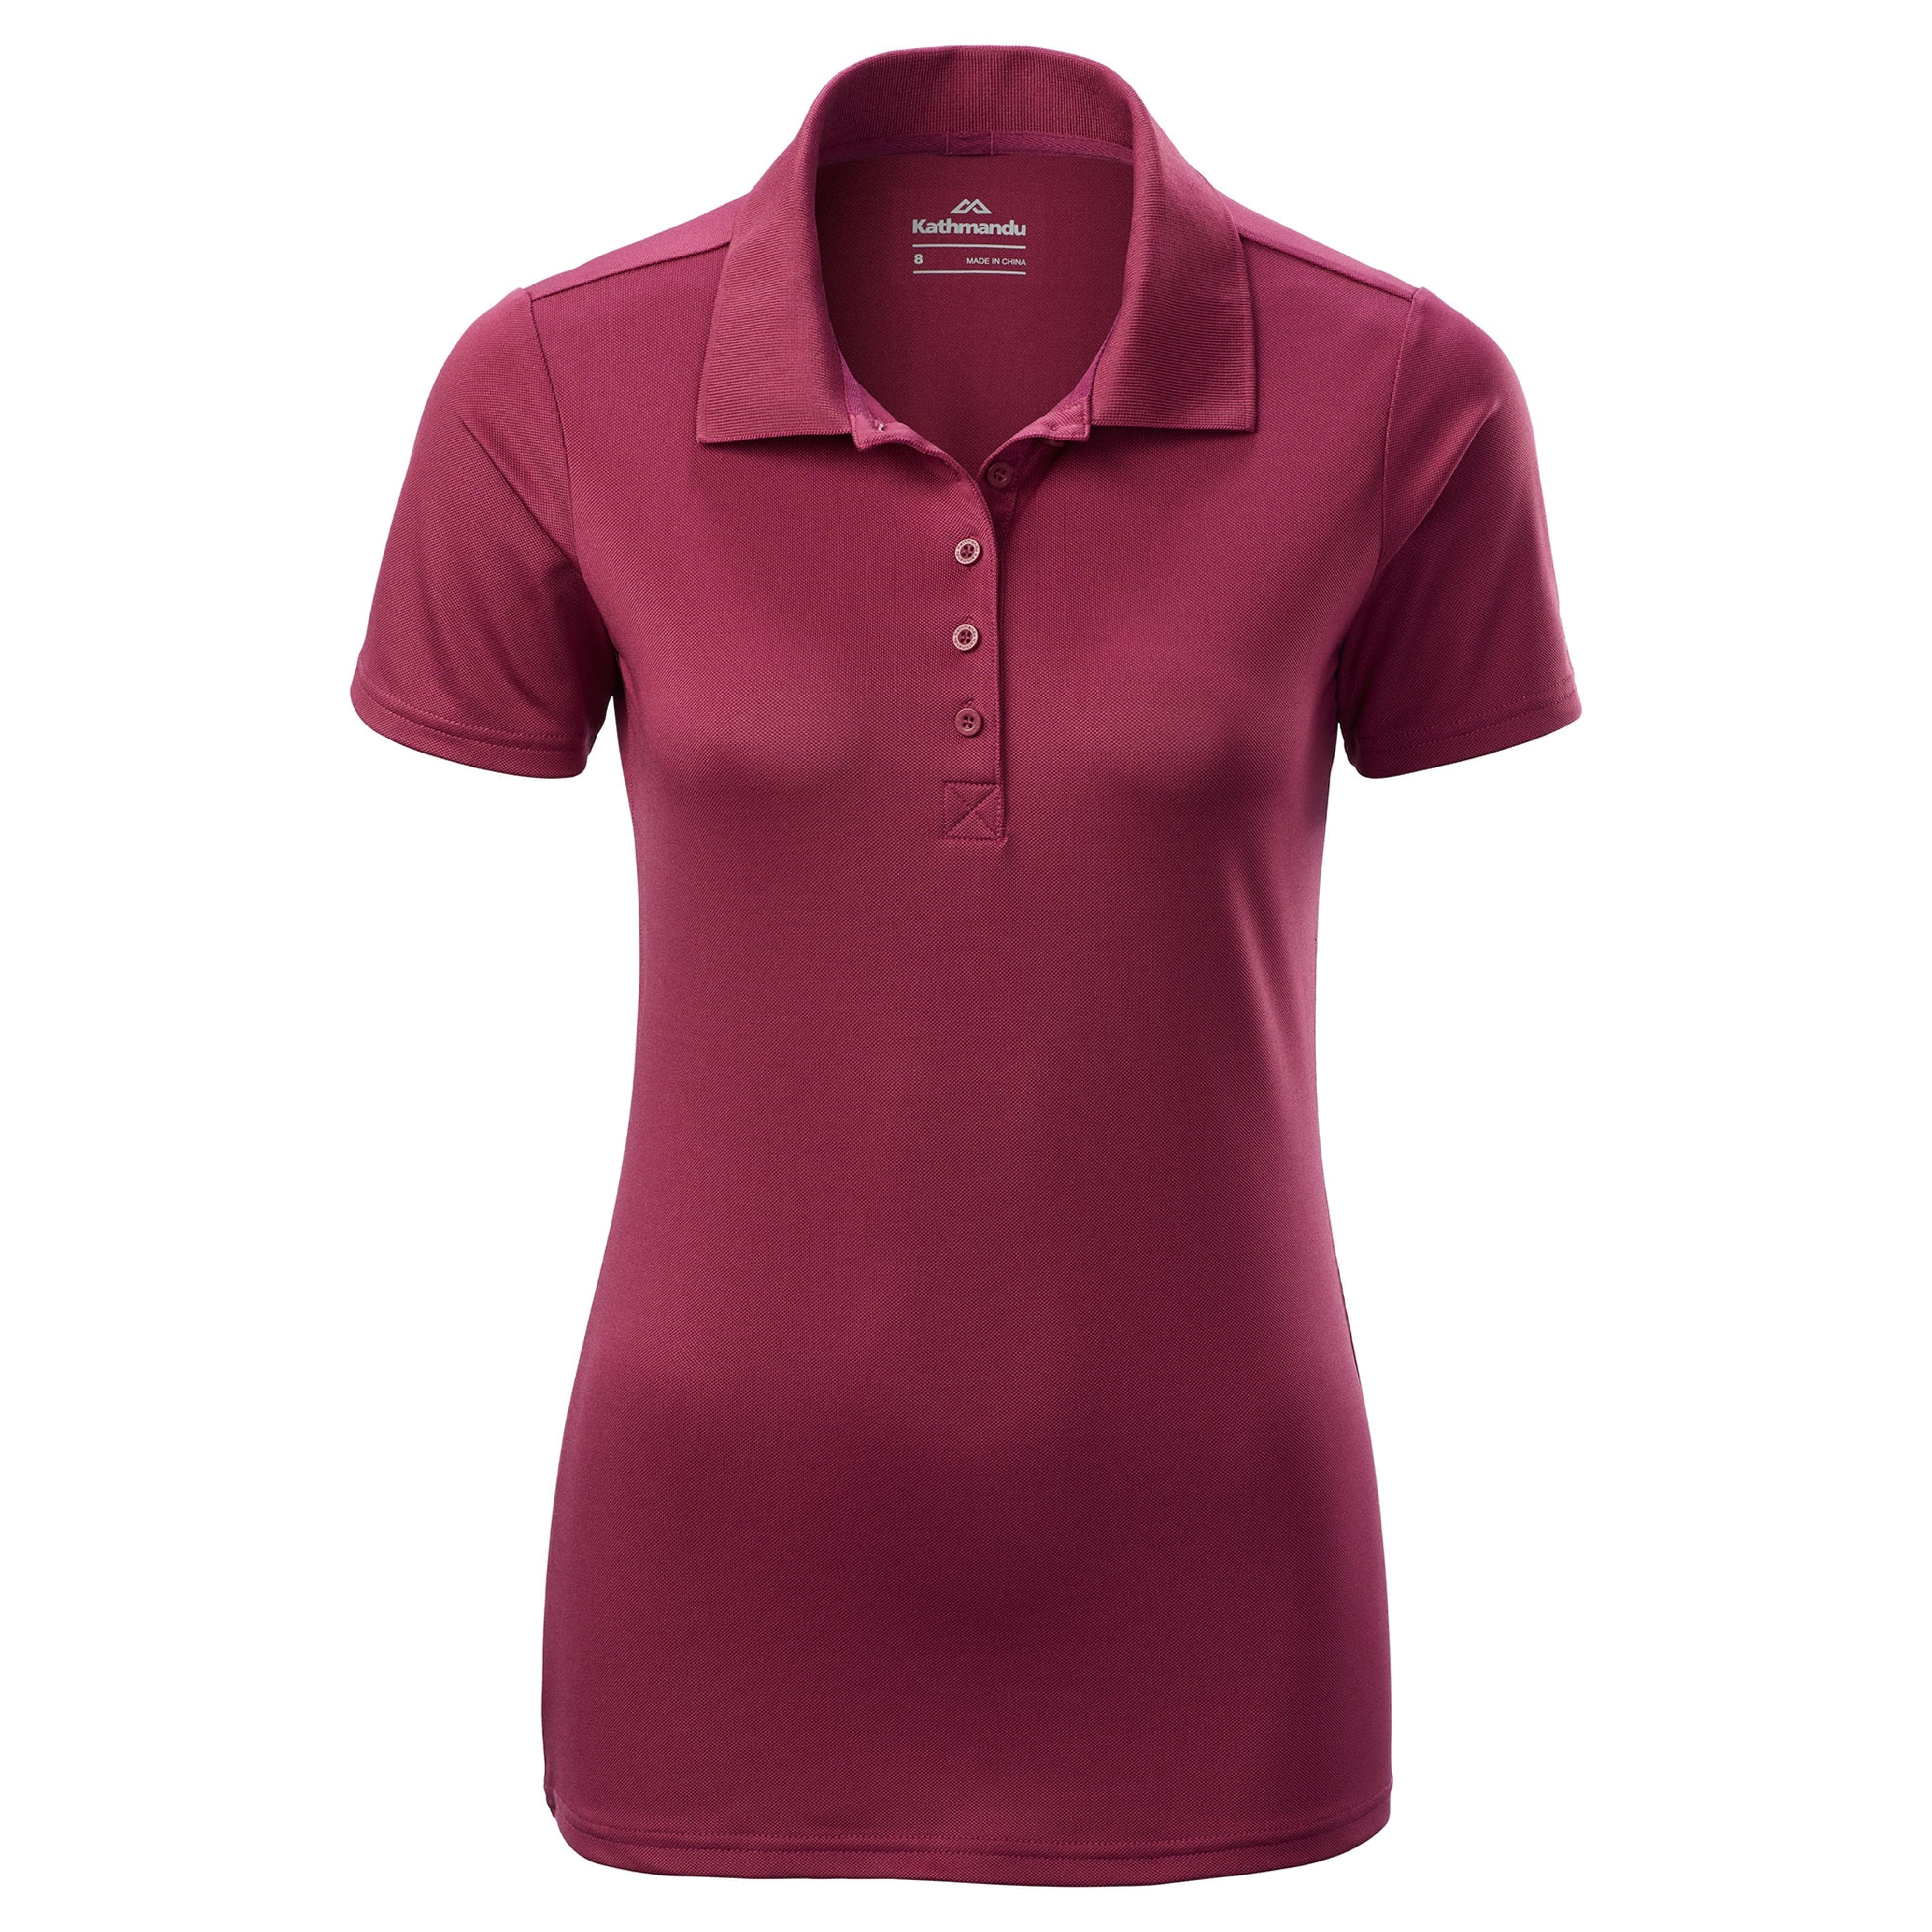 Vanua Women s Short Sleeve Polo Shirt v2 - Putty 5088350c1c